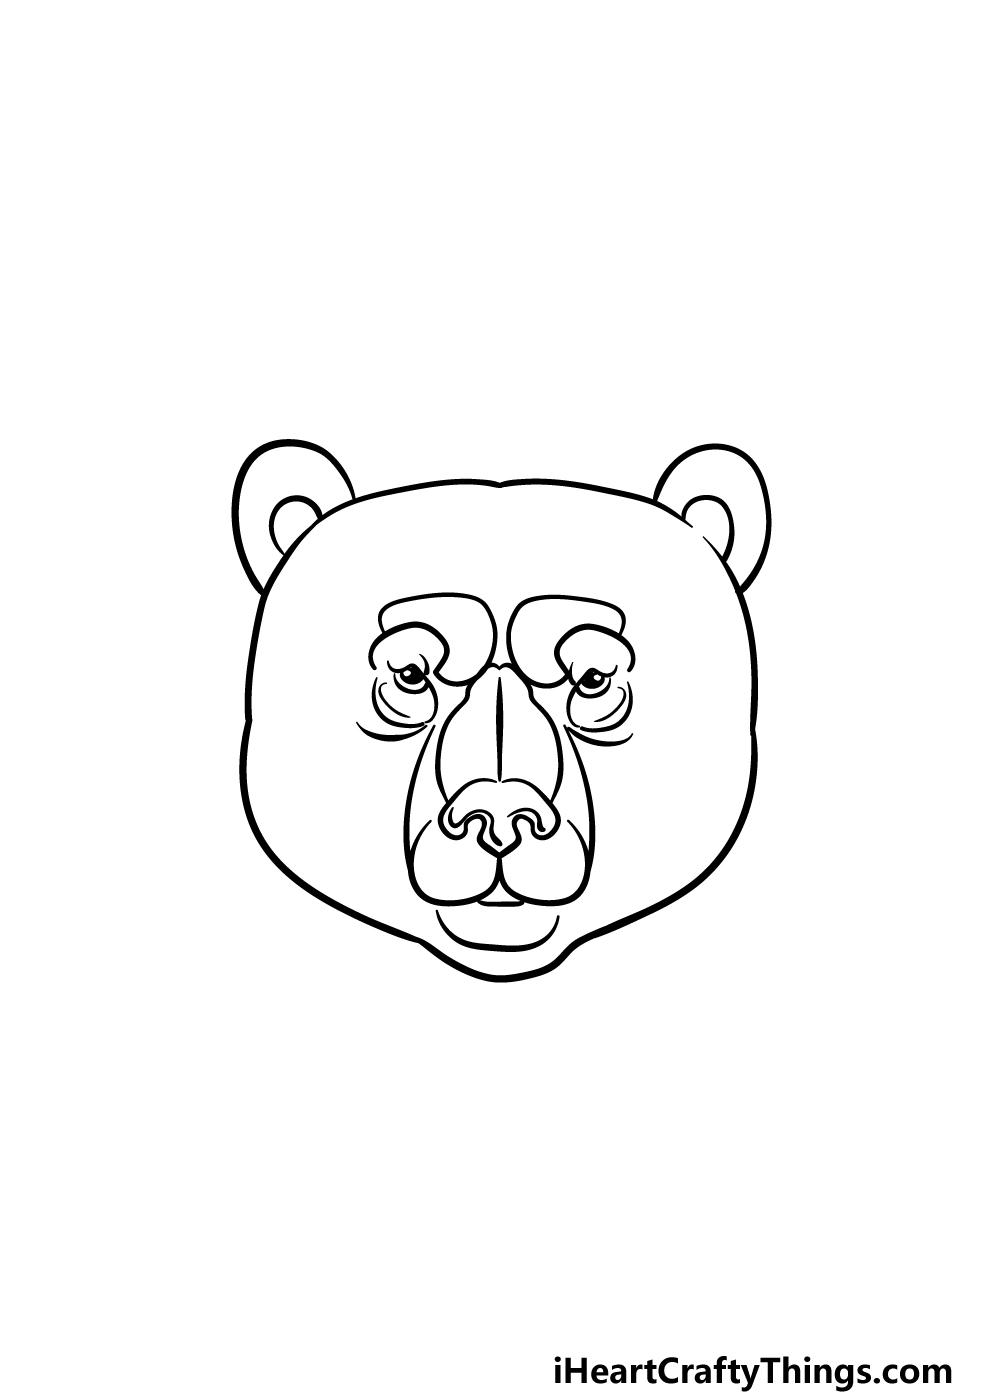 drawing a bear face step 4